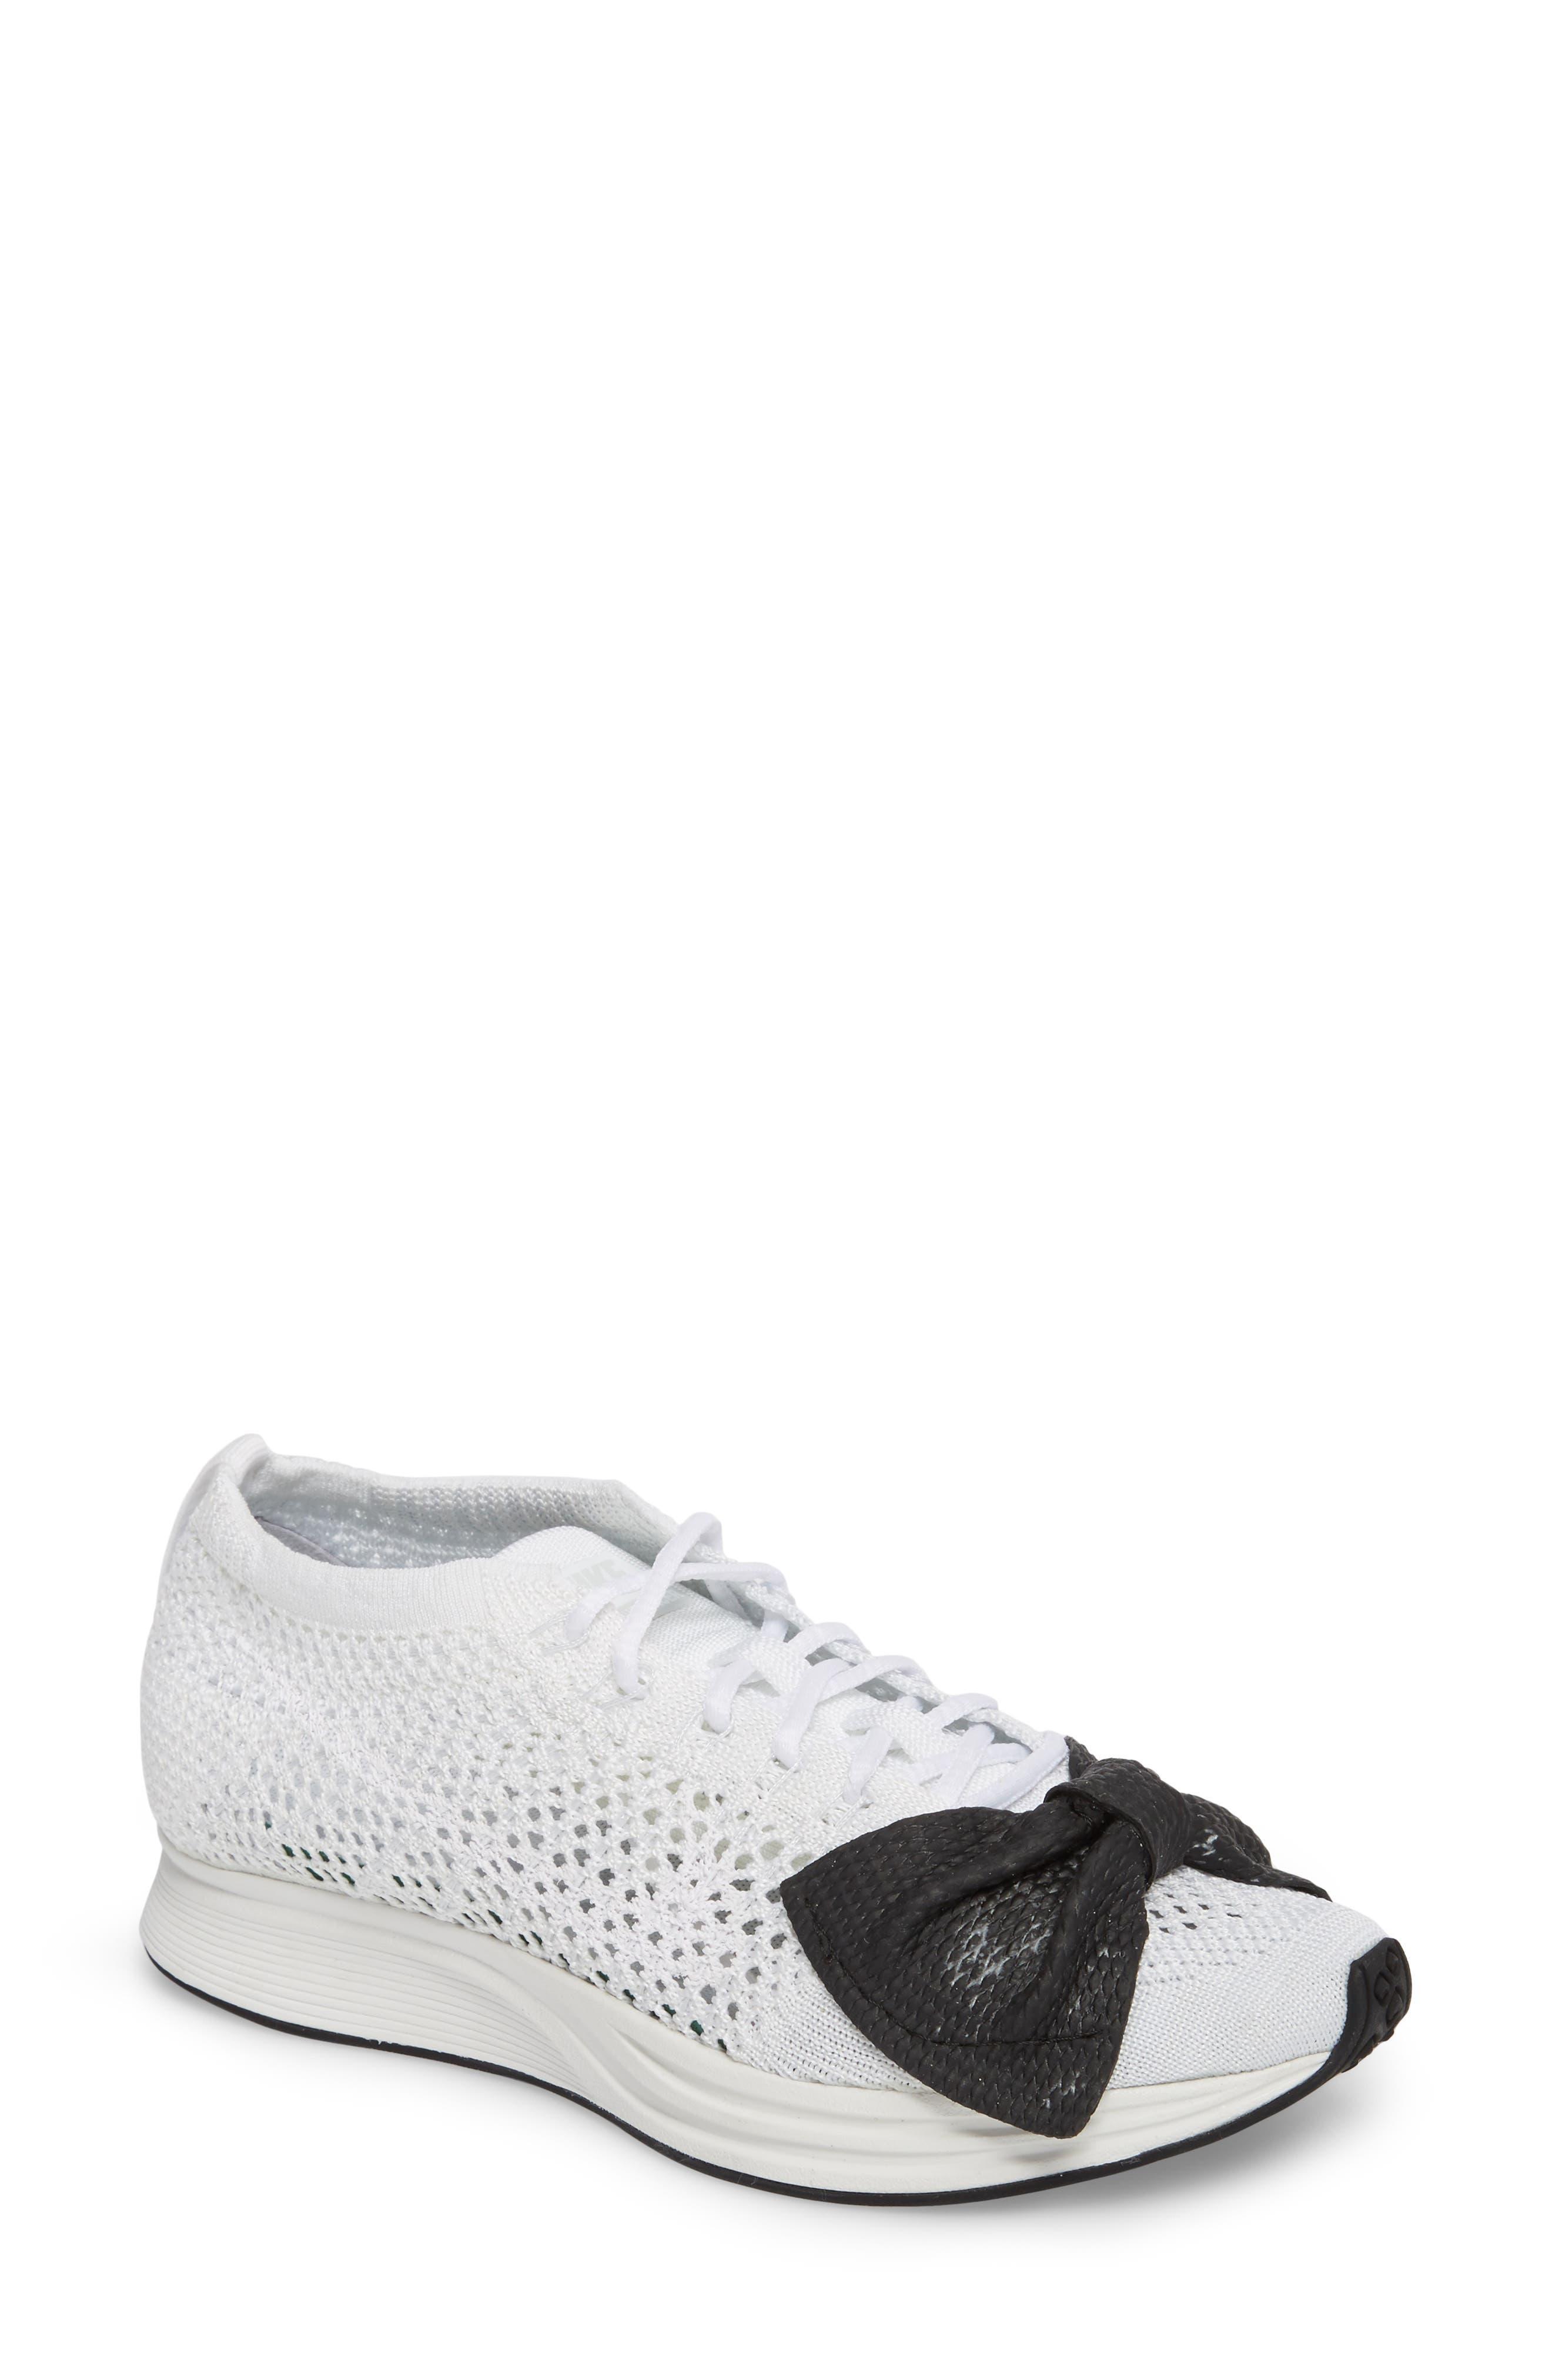 x Nike Bow Flyknit Racer Sneaker,                         Main,                         color, 101